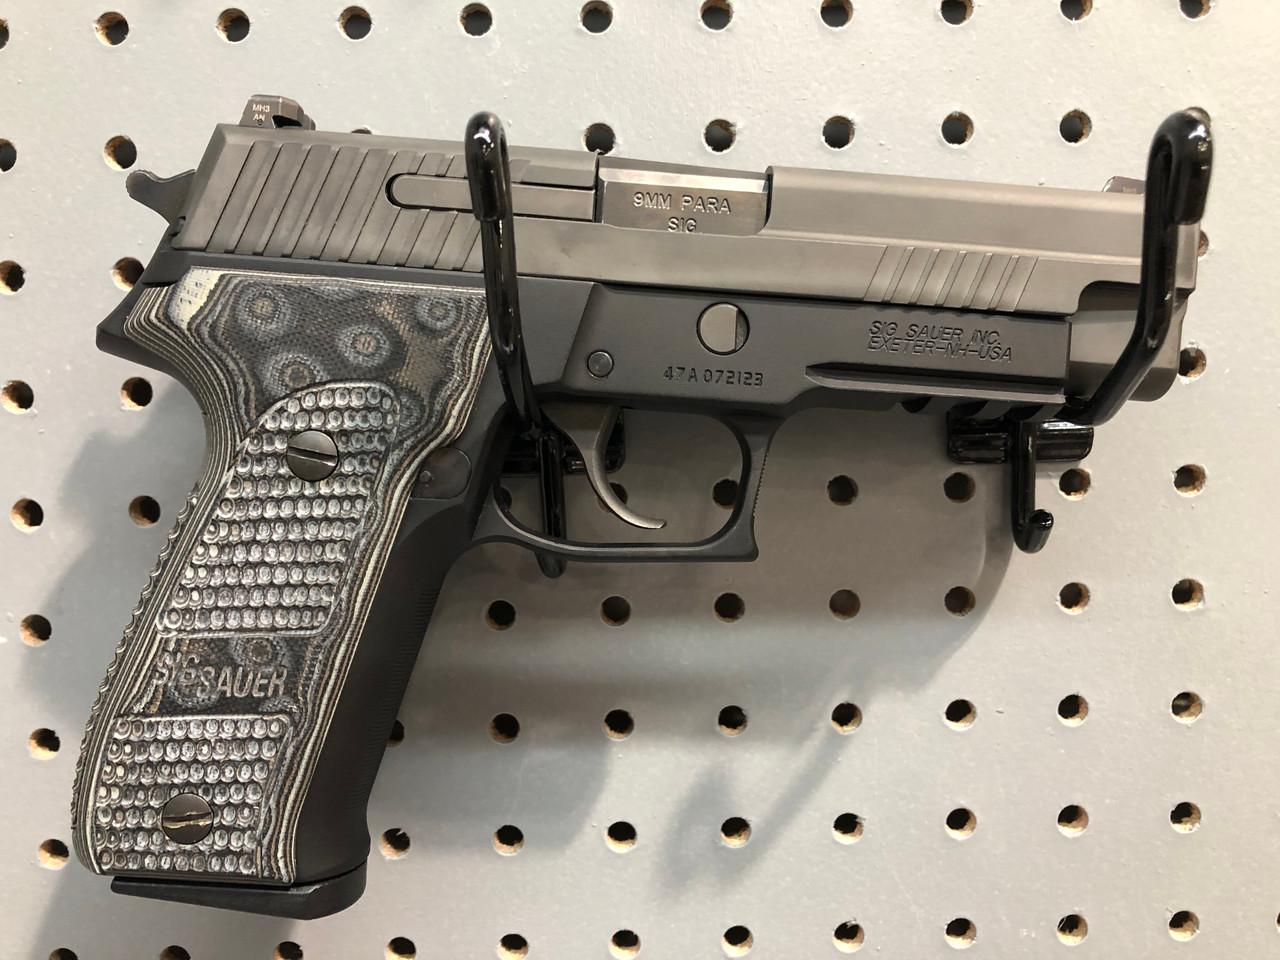 USED Sig Sauer P226 Extreme 9mm w/Three Magazines